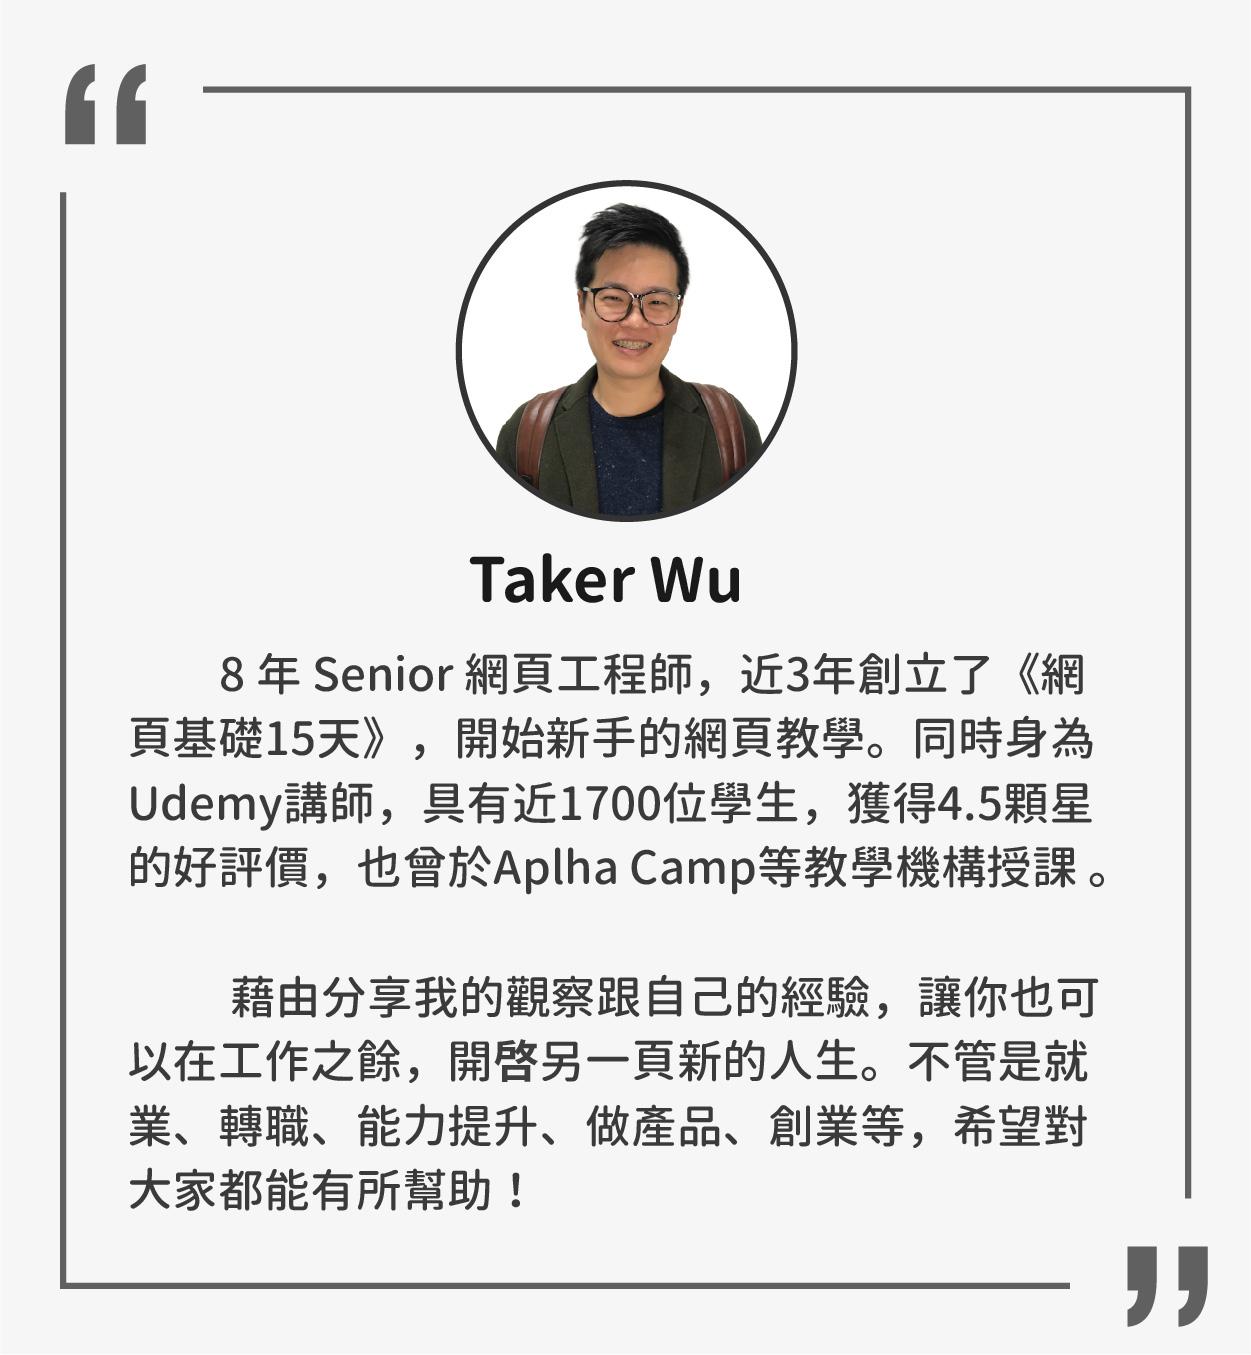 taker 程式設計